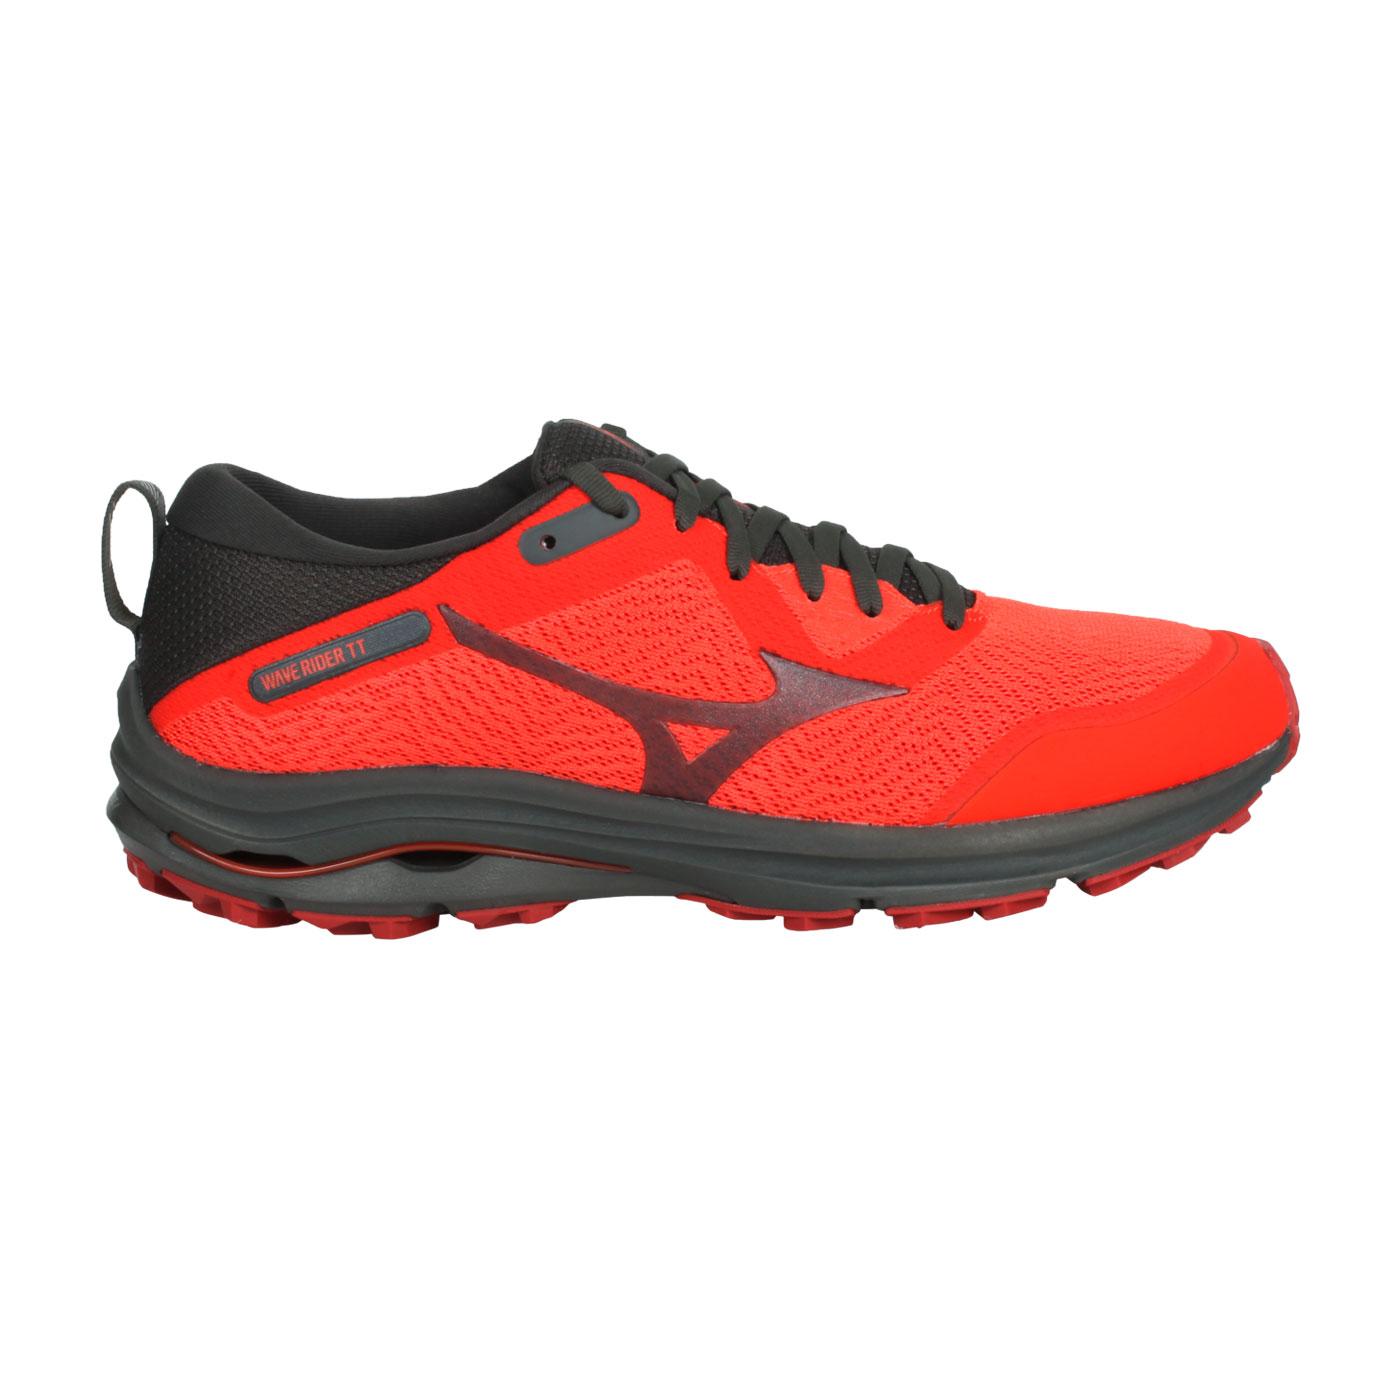 MIZUNO 男款慢跑鞋  @WAVE RIDER TT@J1GC213215 - 深灰橘